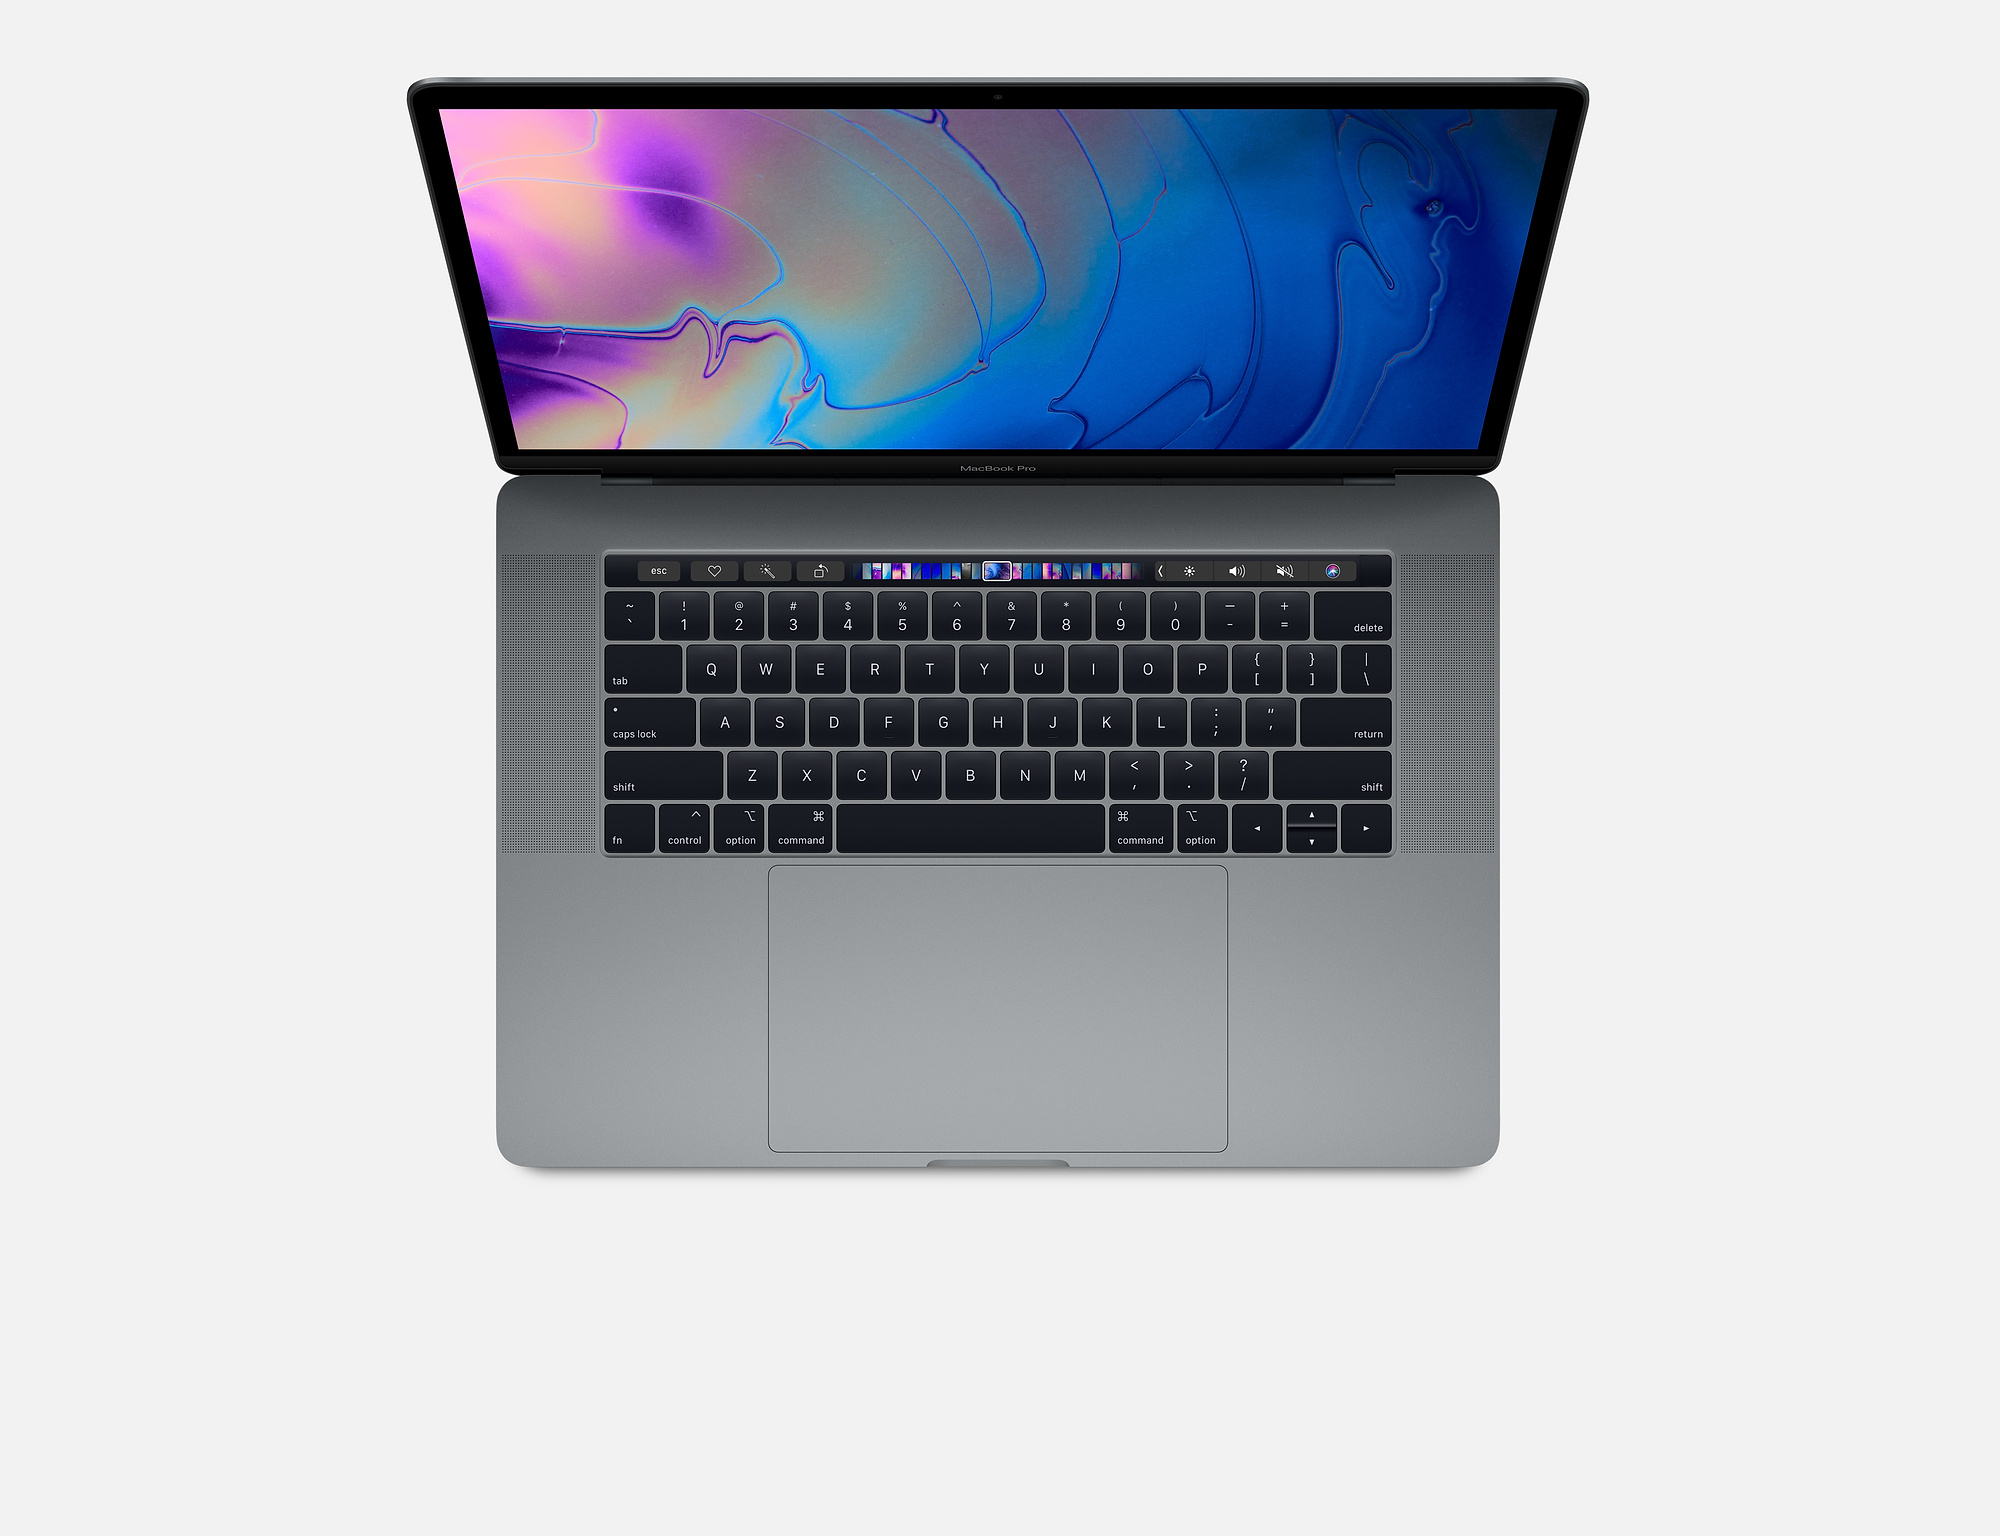 New MacBook Pro 15-inch photo